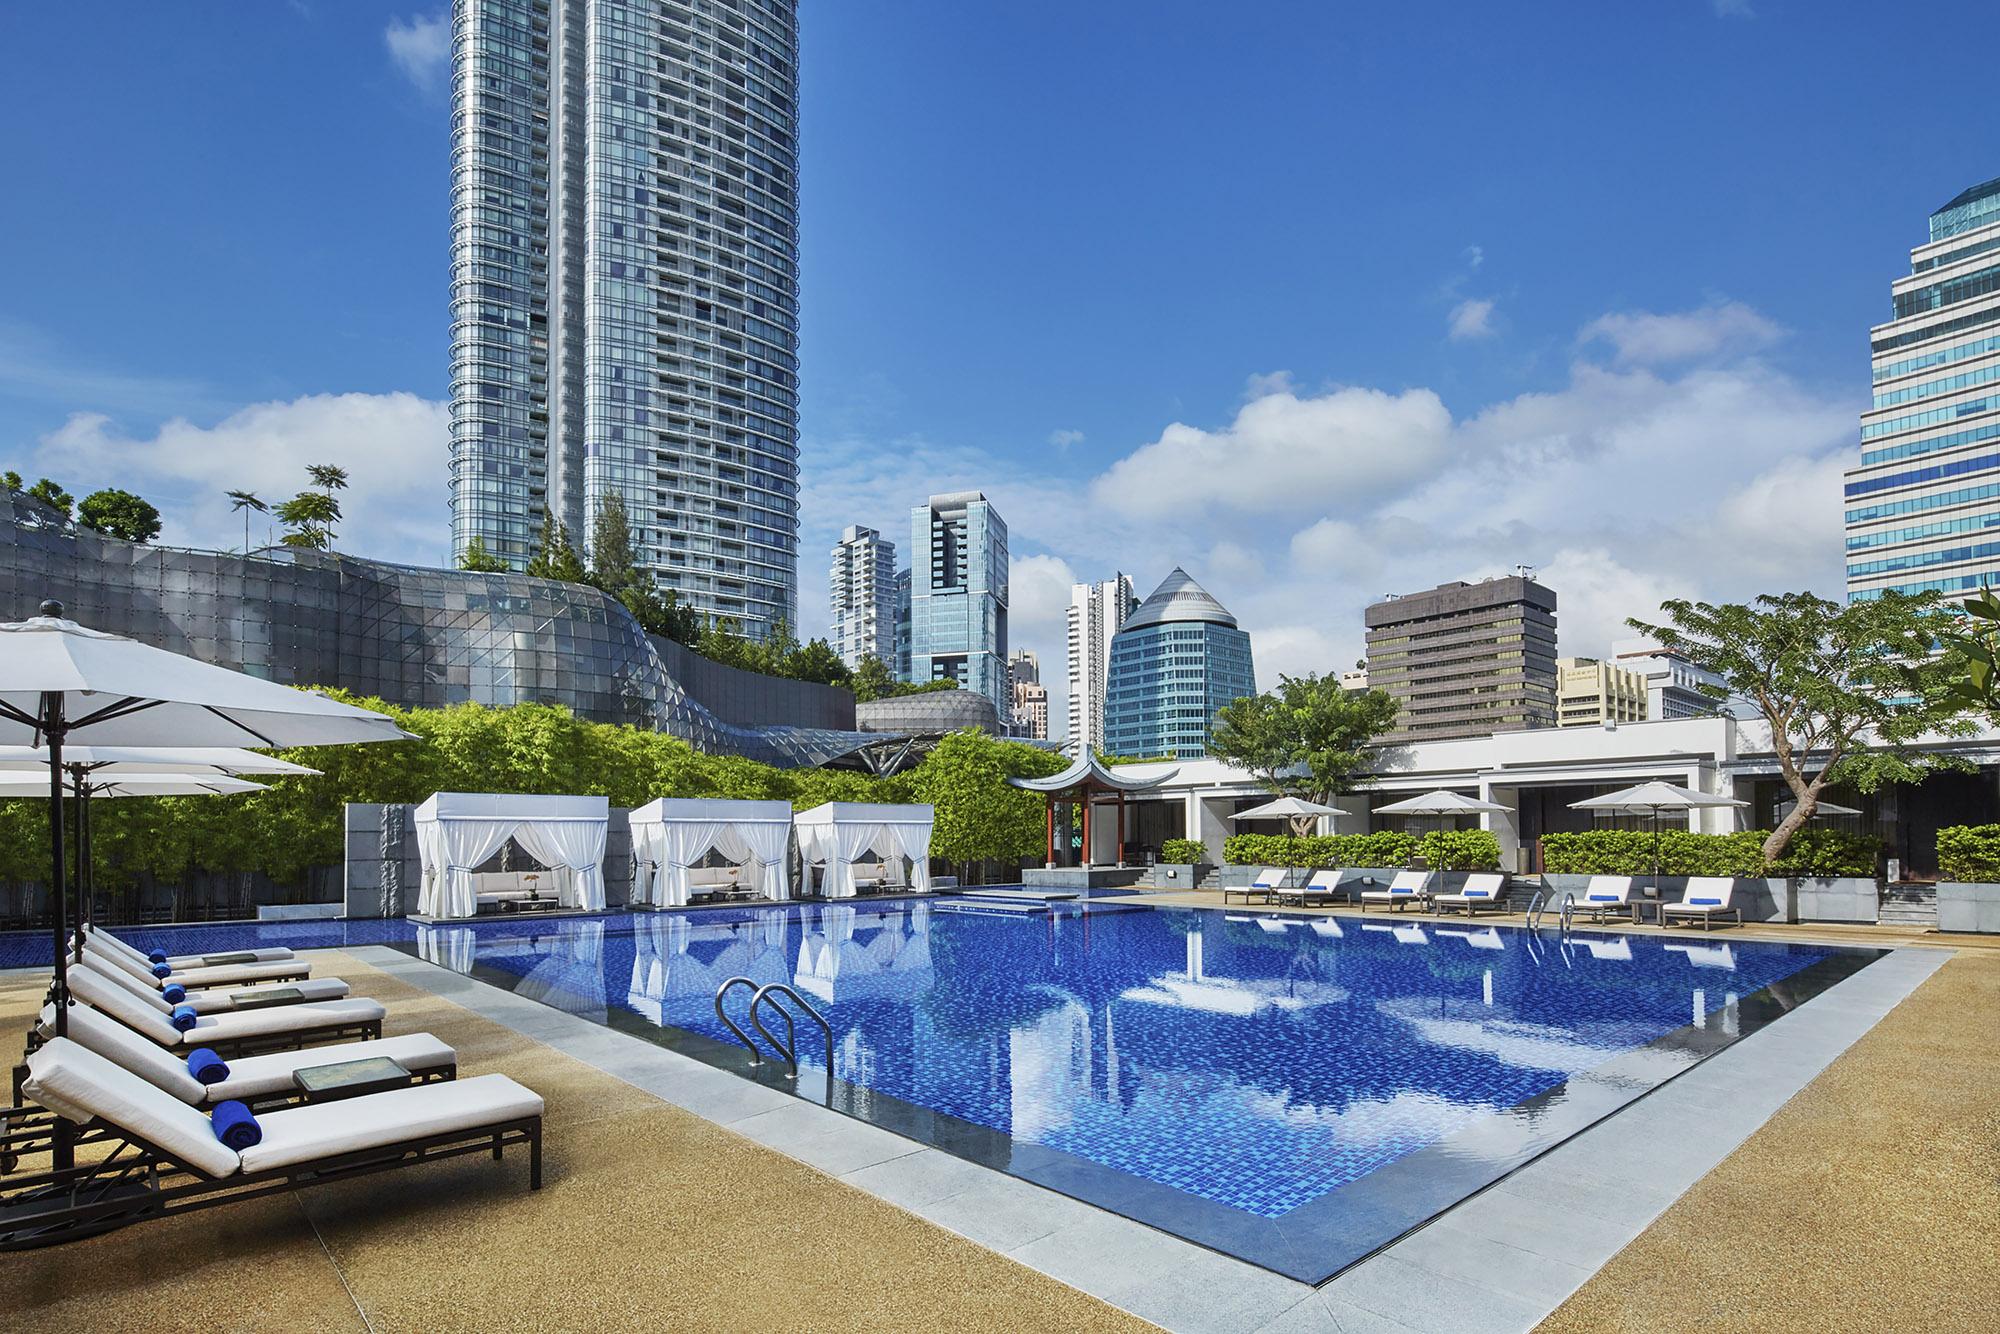 Marriott Tang Plaza Pool (Marriott)